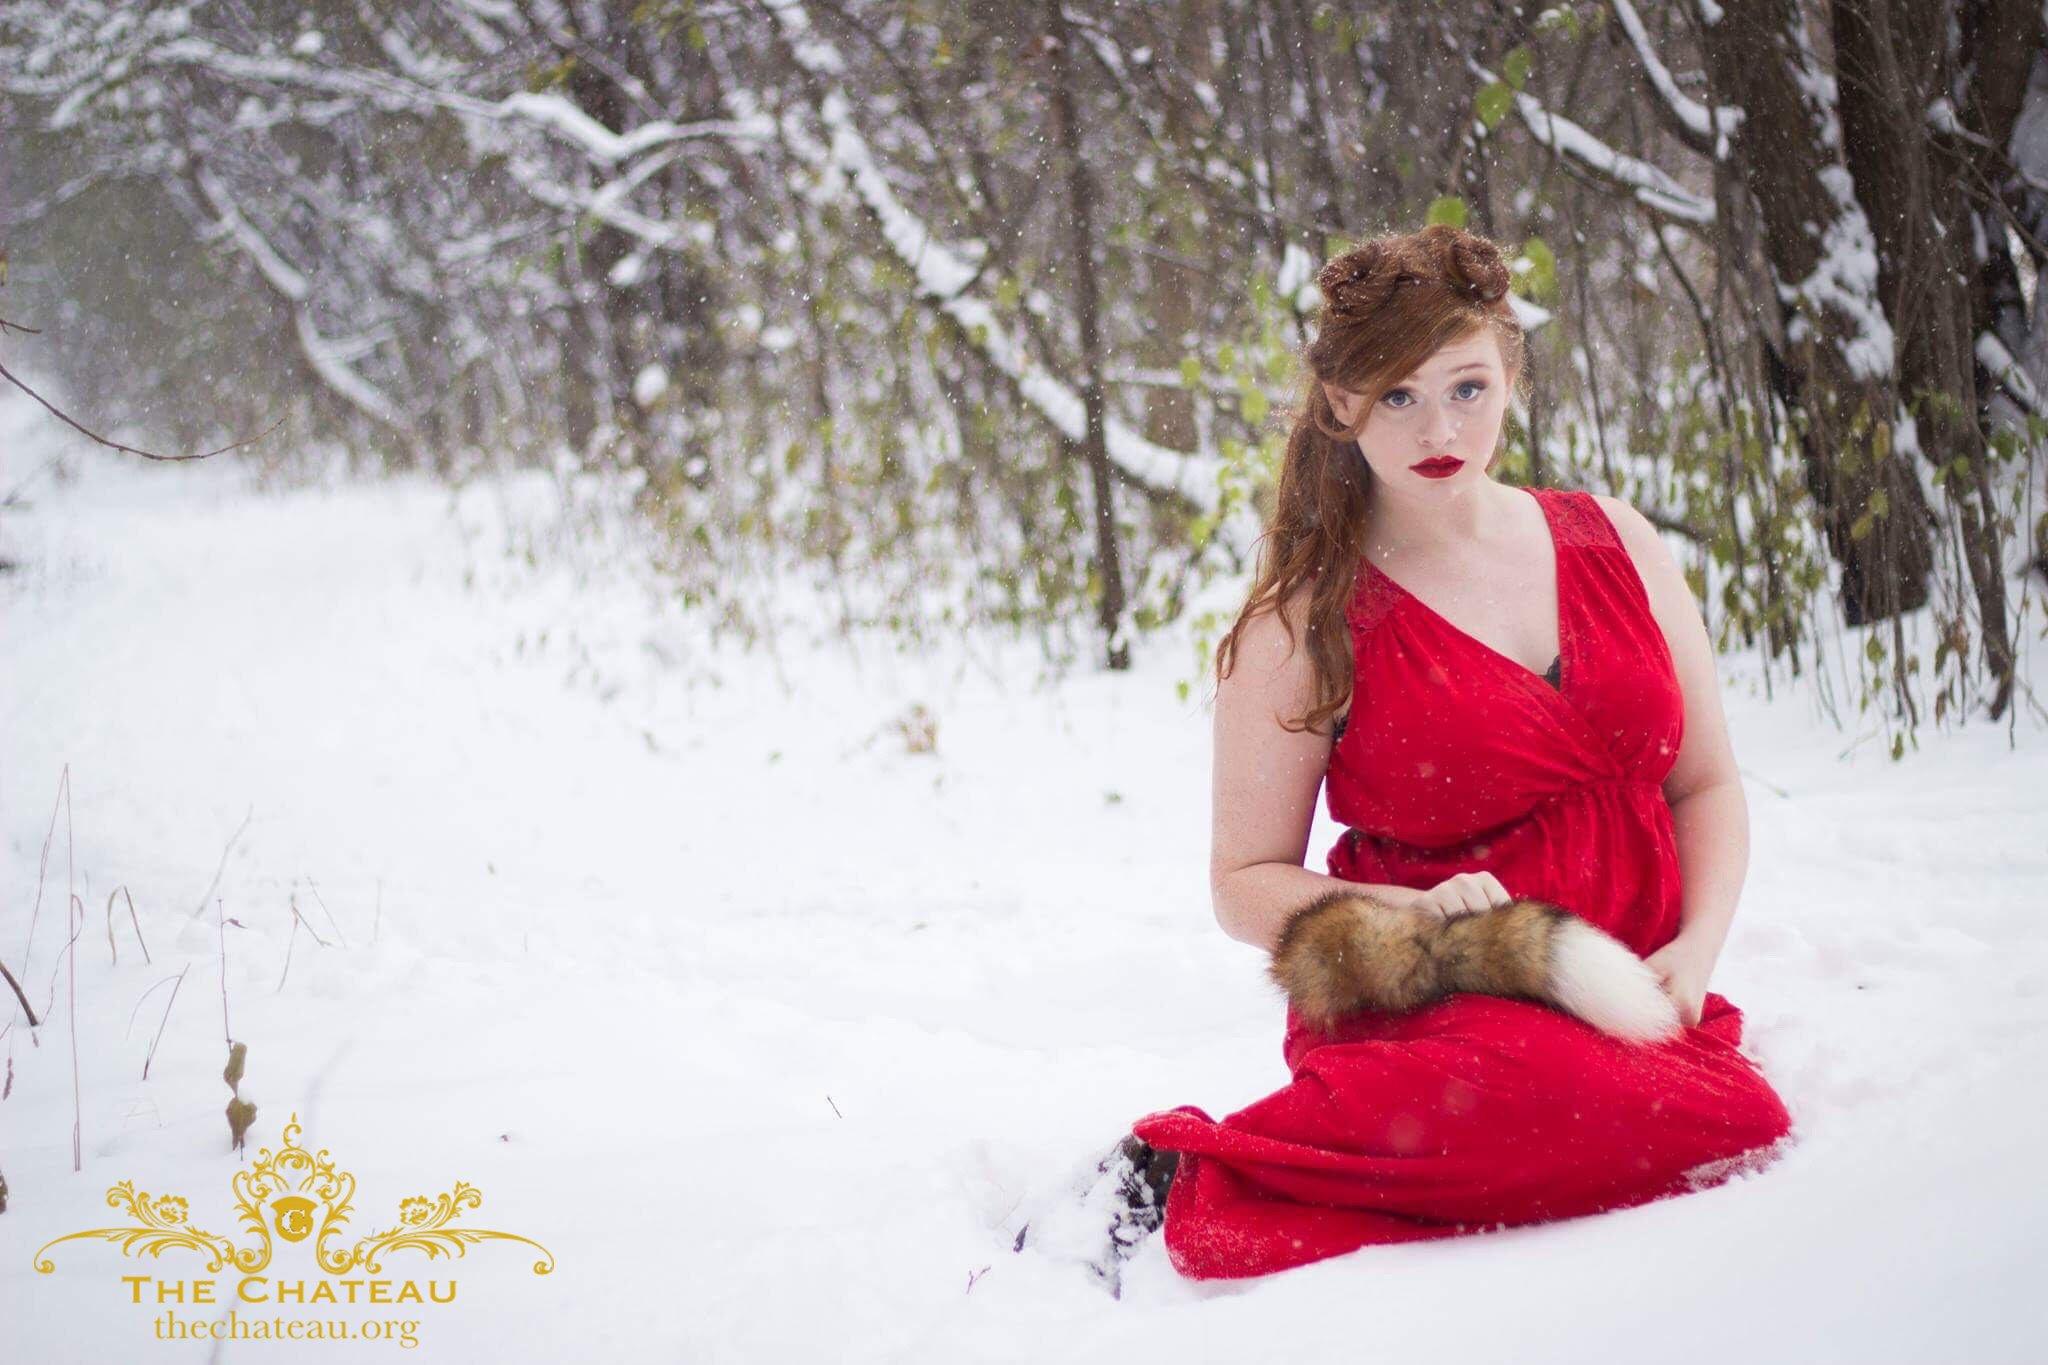 Snow Fox post thumbnail